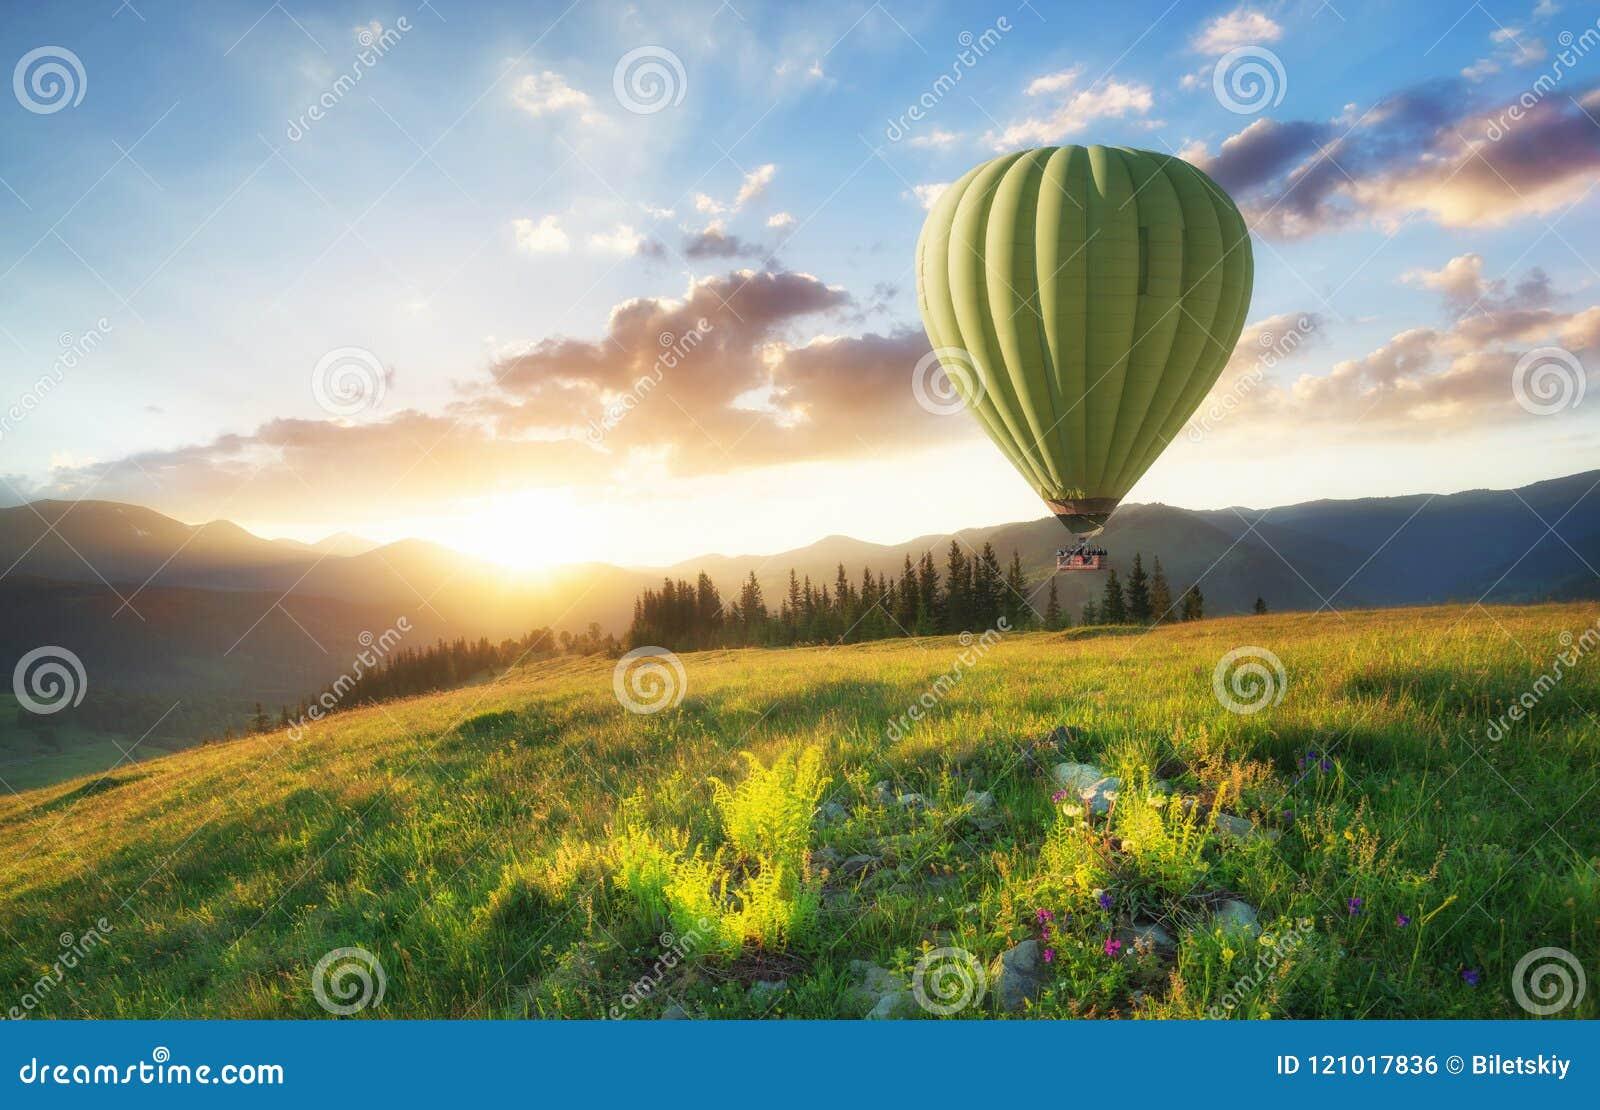 Air ballon above mountains at the summer time.